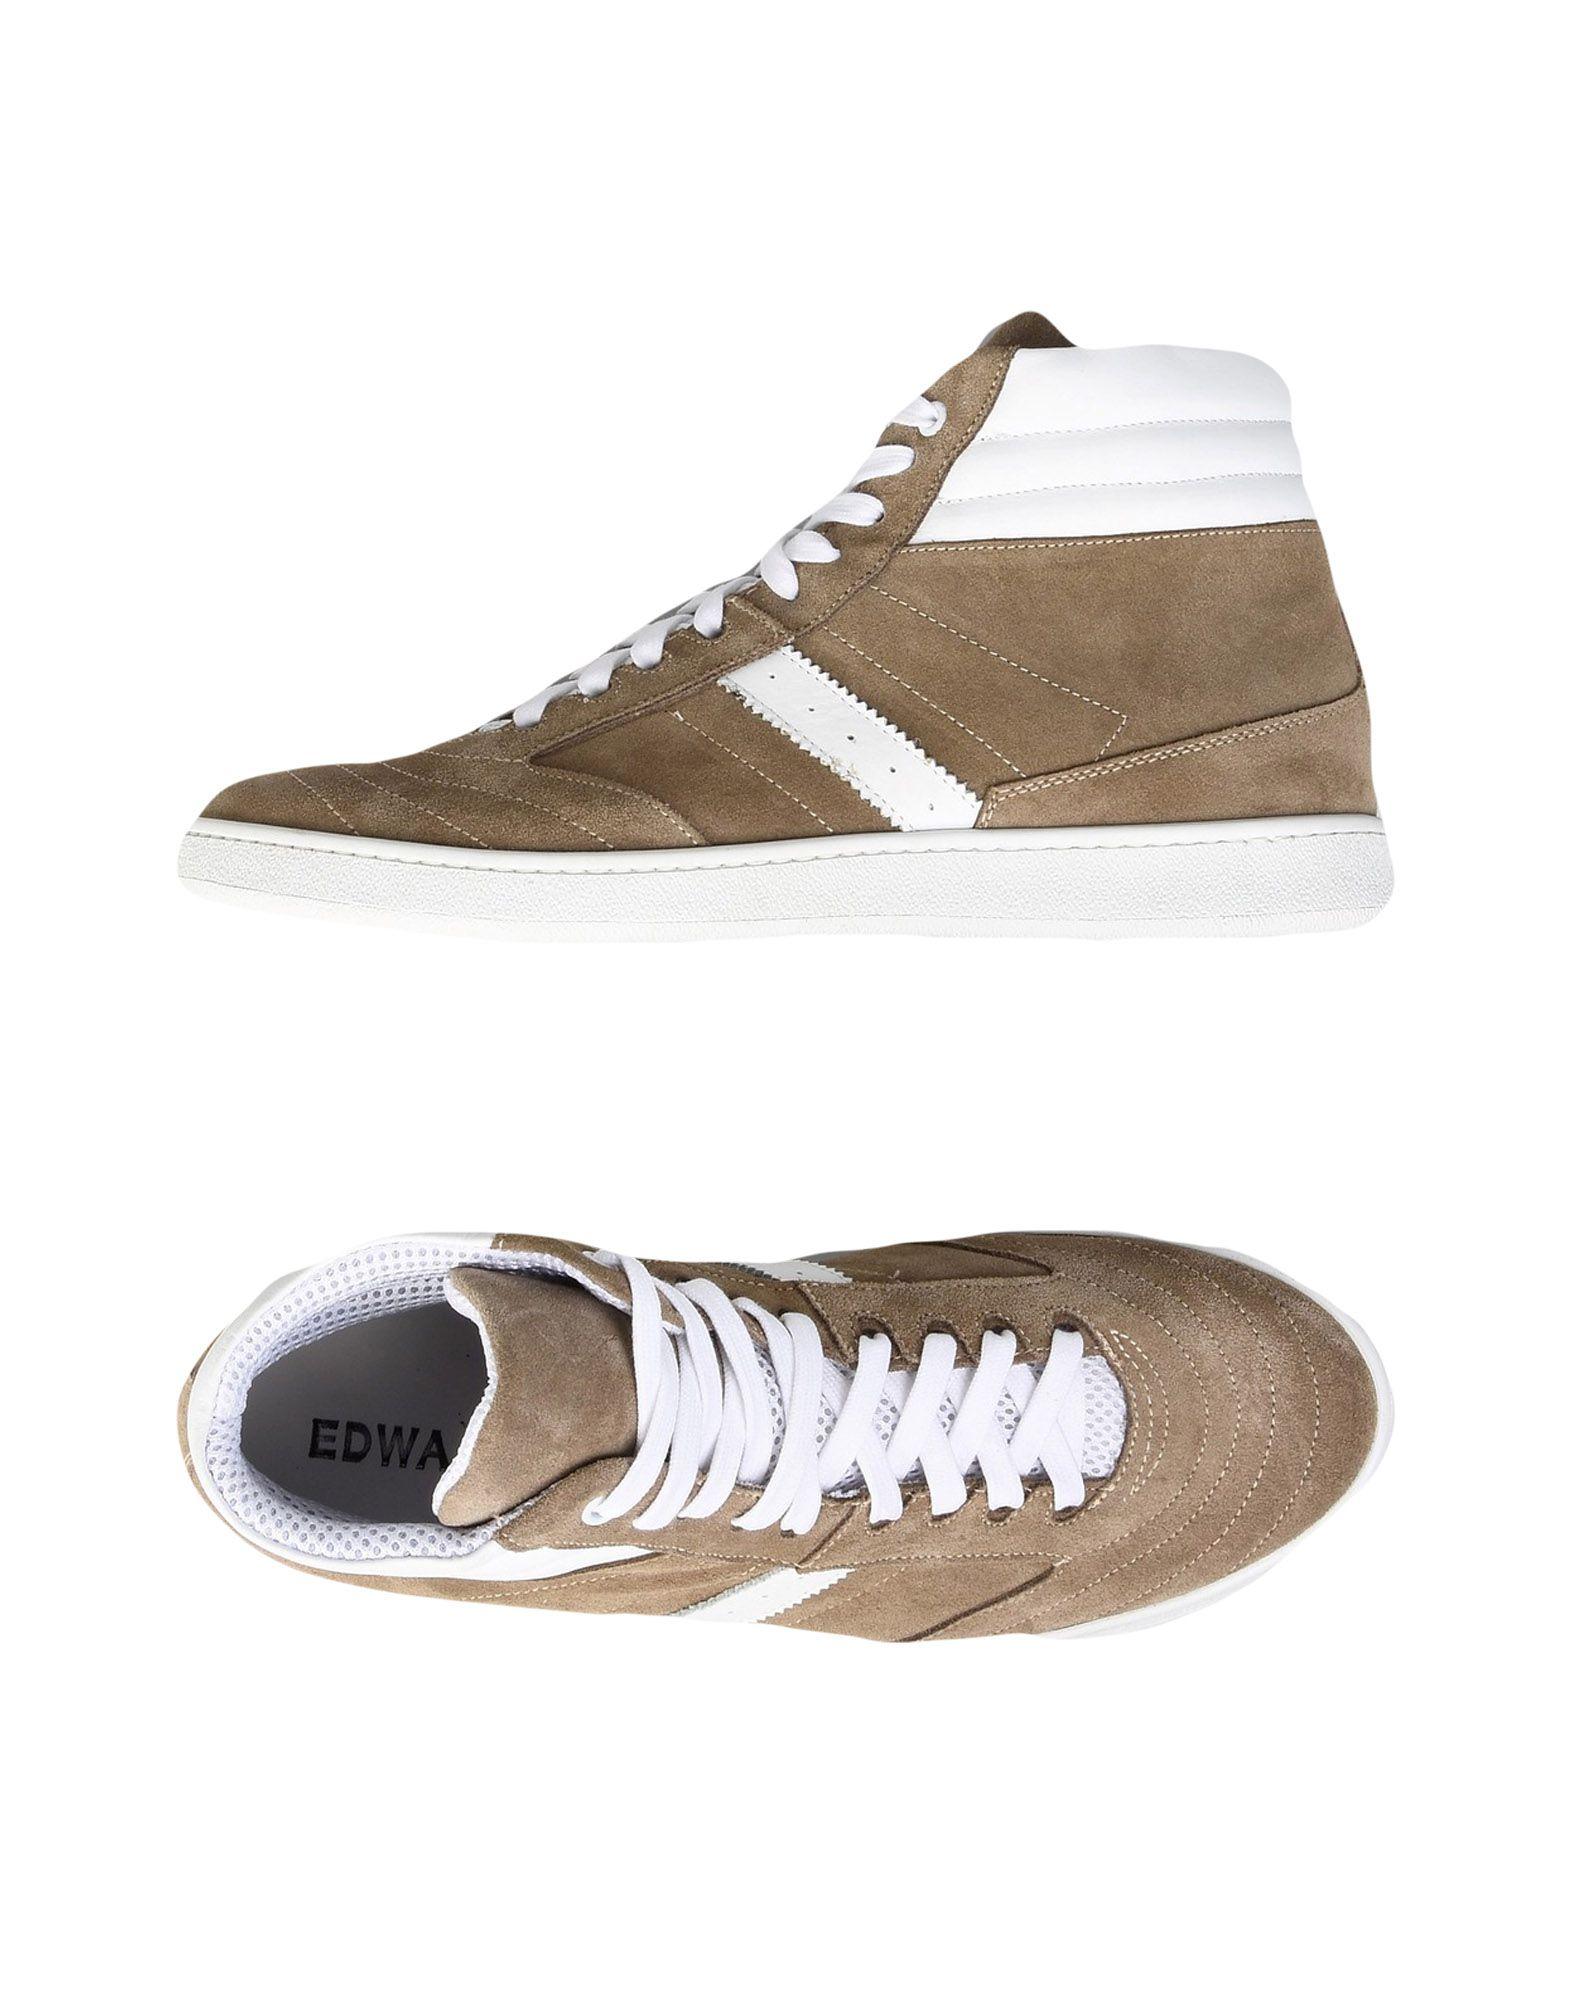 Rabatt echte Schuhe Edwa Sneakers Herren  11217291TX